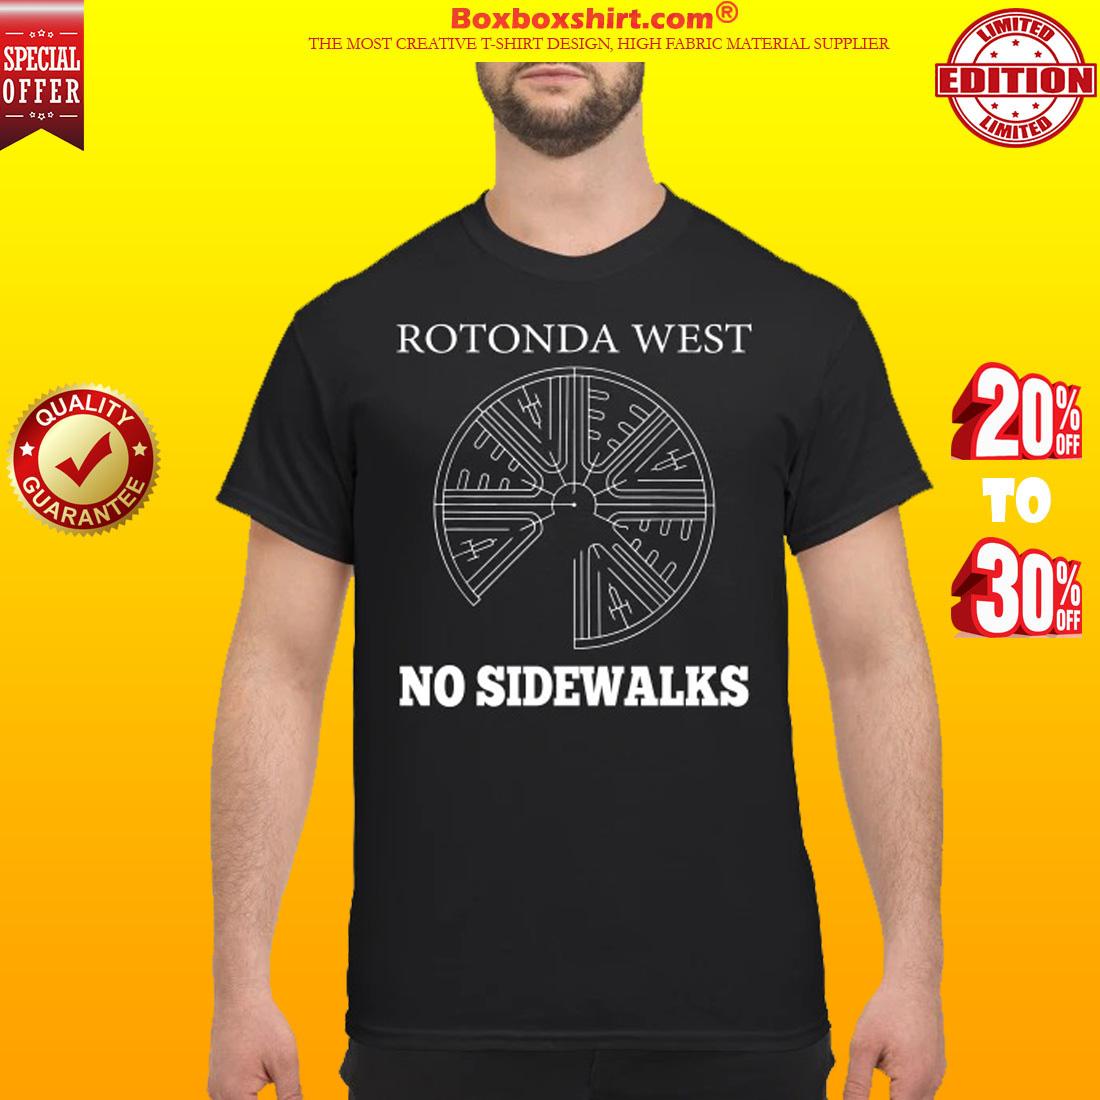 Rotonda West no sidewalks shirt